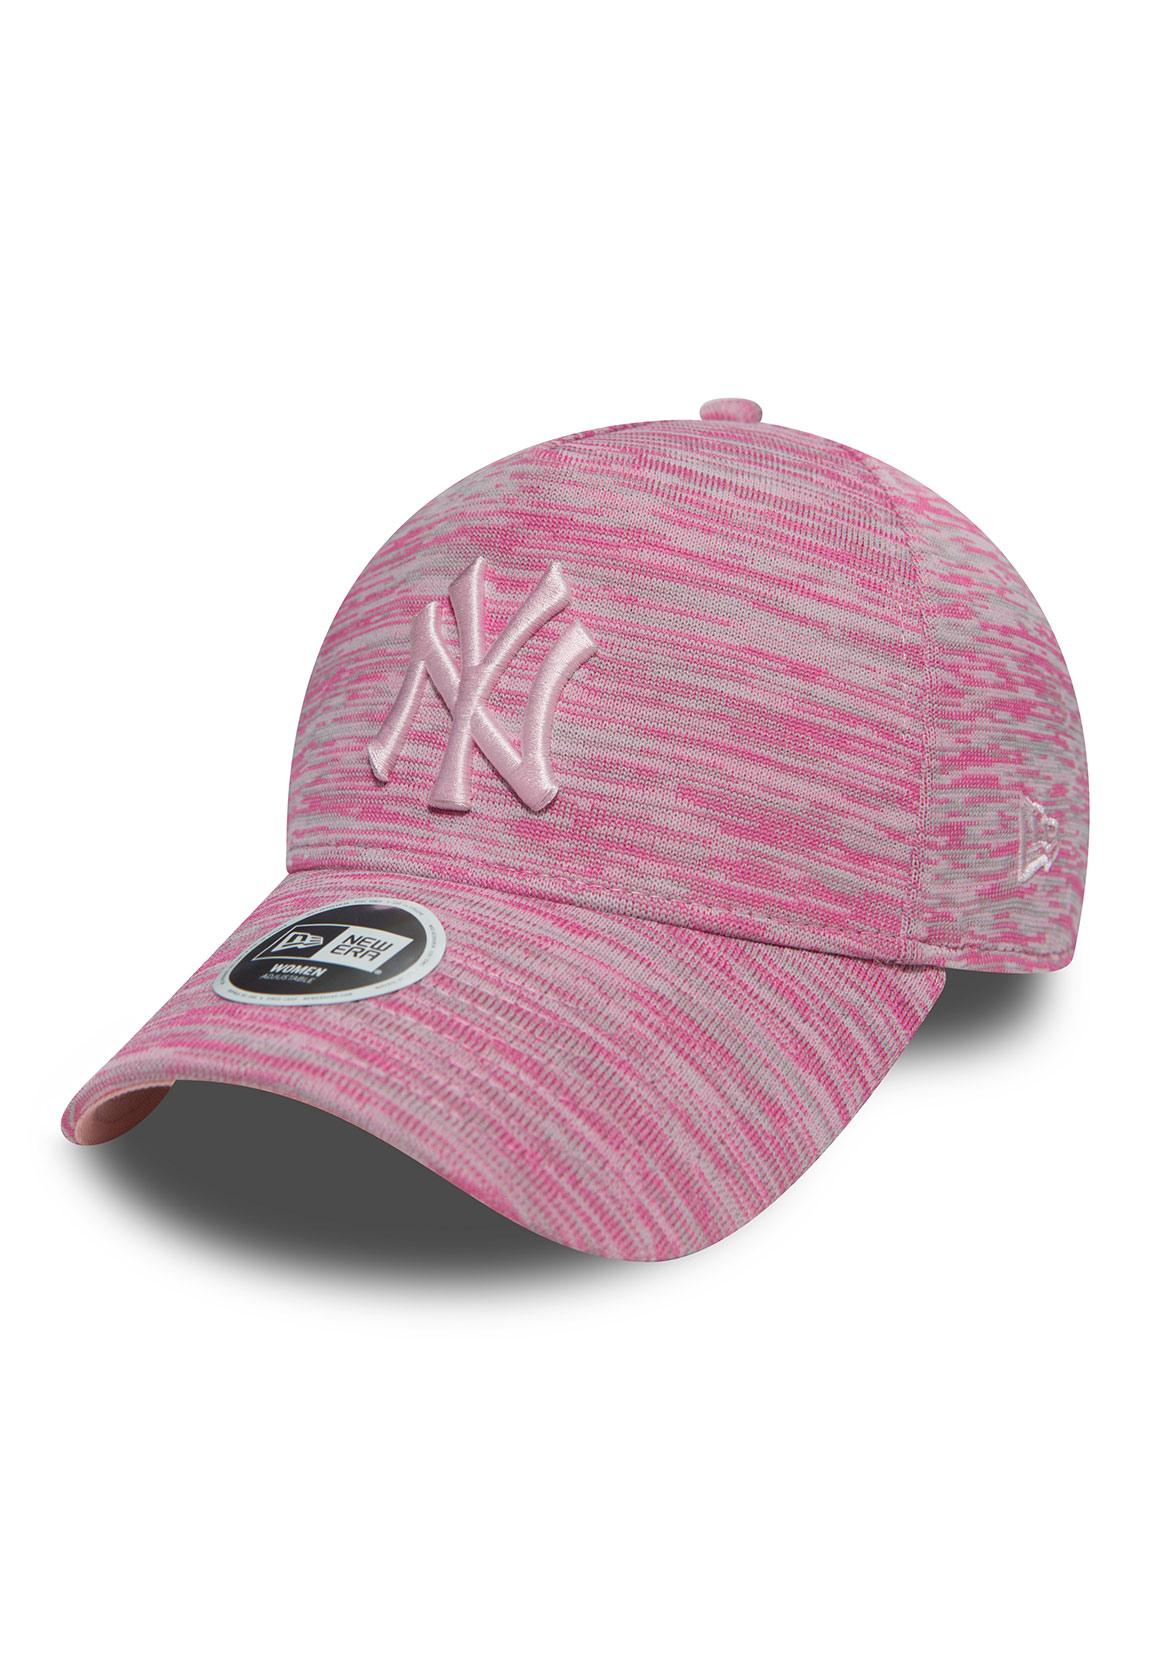 3b1816be4b338 New Era Étroit Coupe Af 9Forty Femmes Réglable Casquette Ny Yankees ...